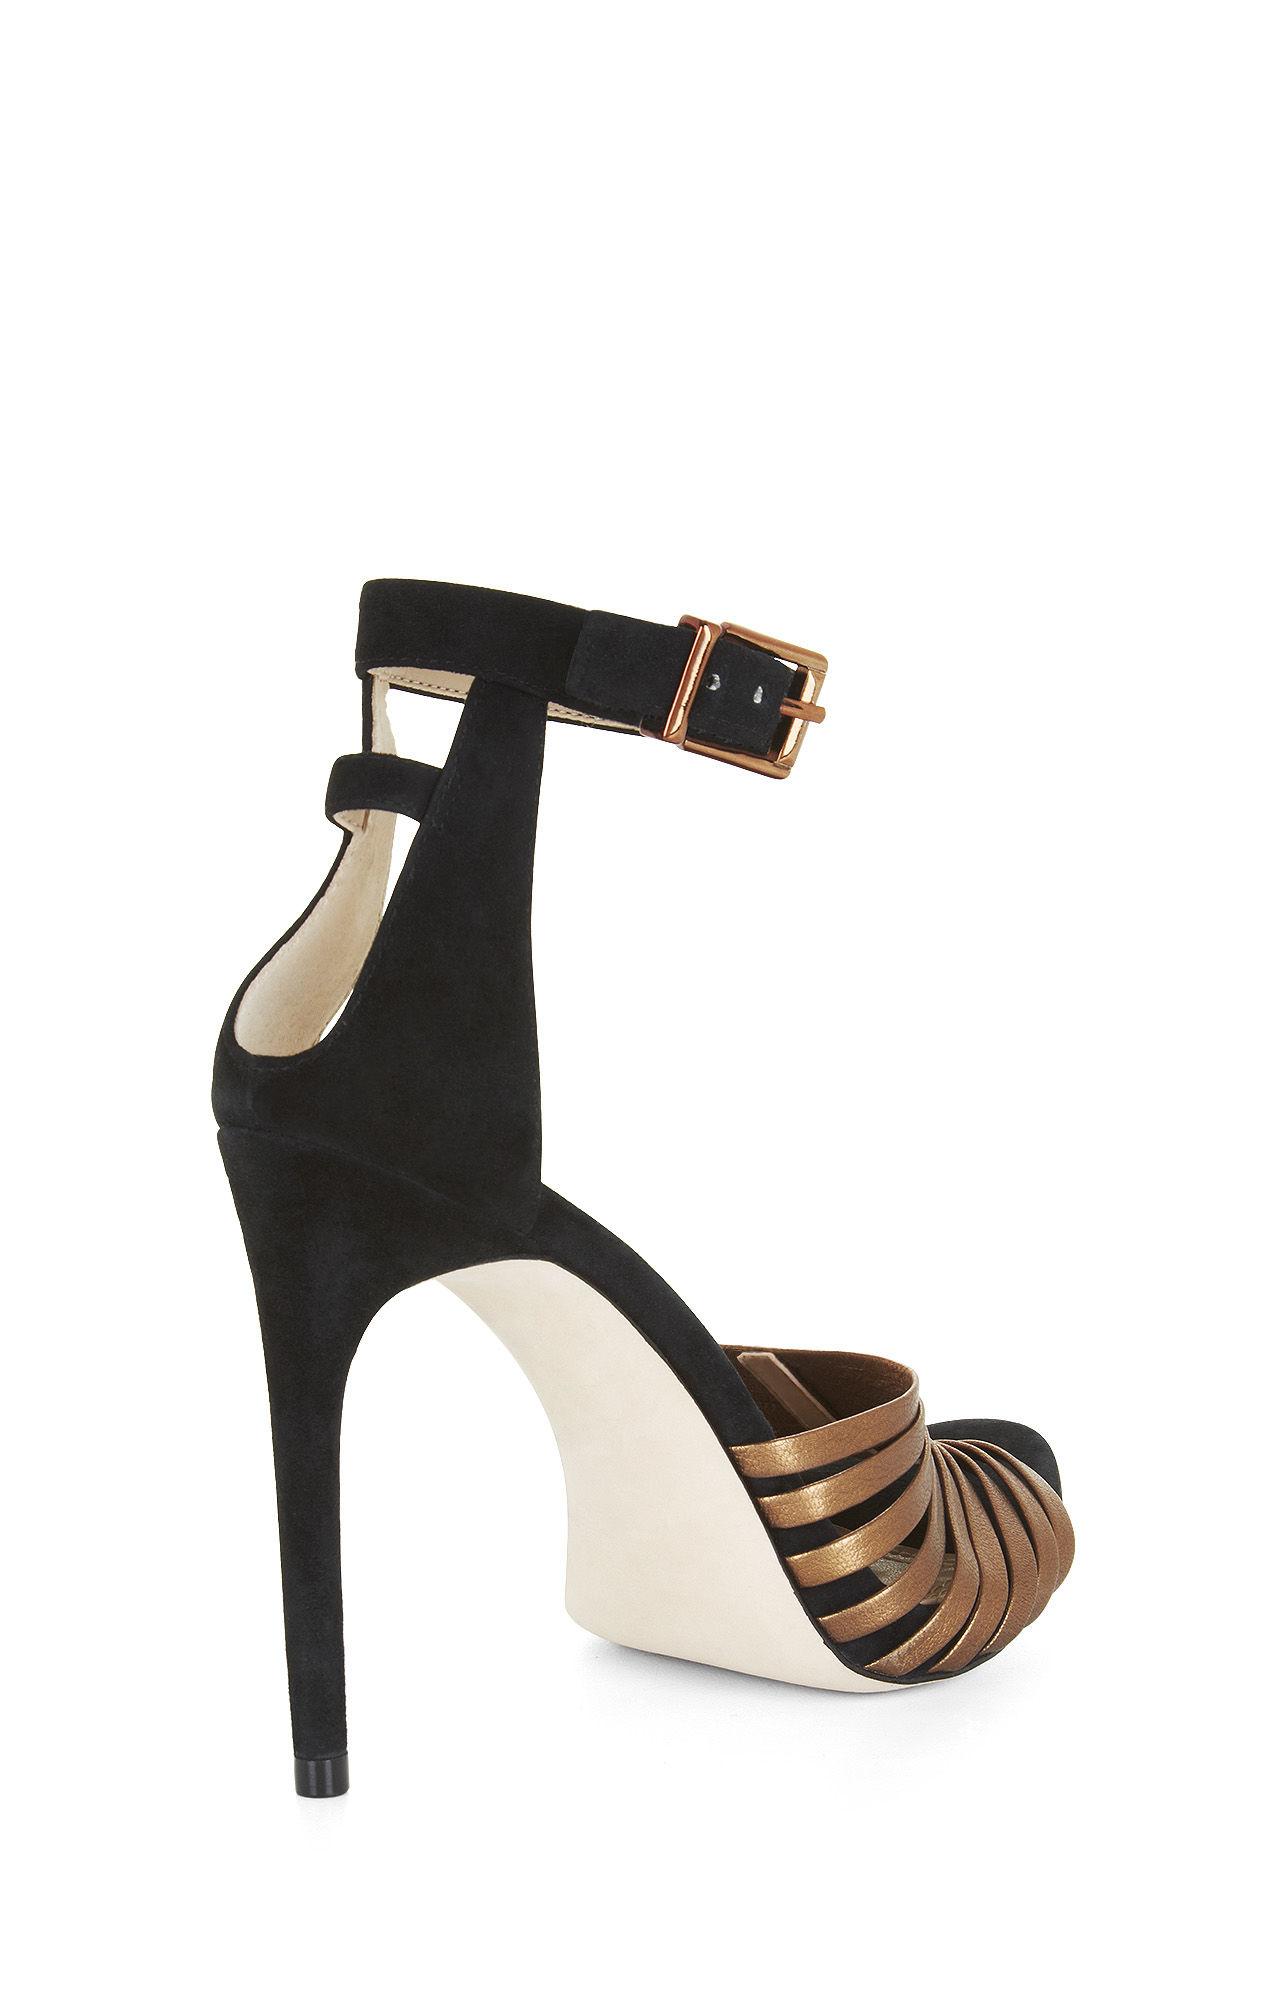 965ec2bcbea Lyst - BCBGMAXAZRIA Dena High-heel Strappy Sandal in Metallic